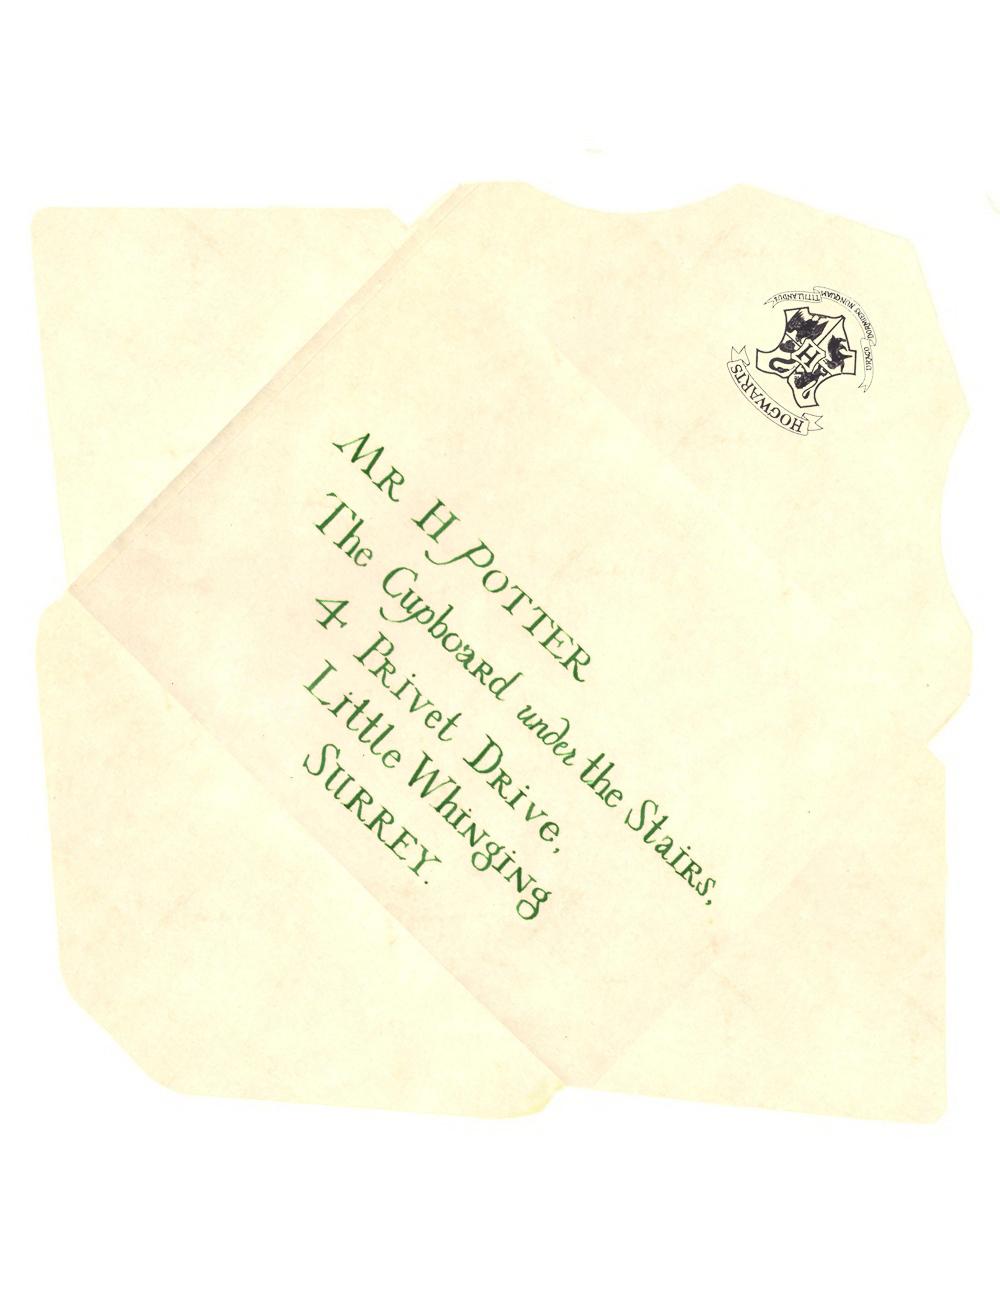 Envelope Harry Potter 3 – invest wight